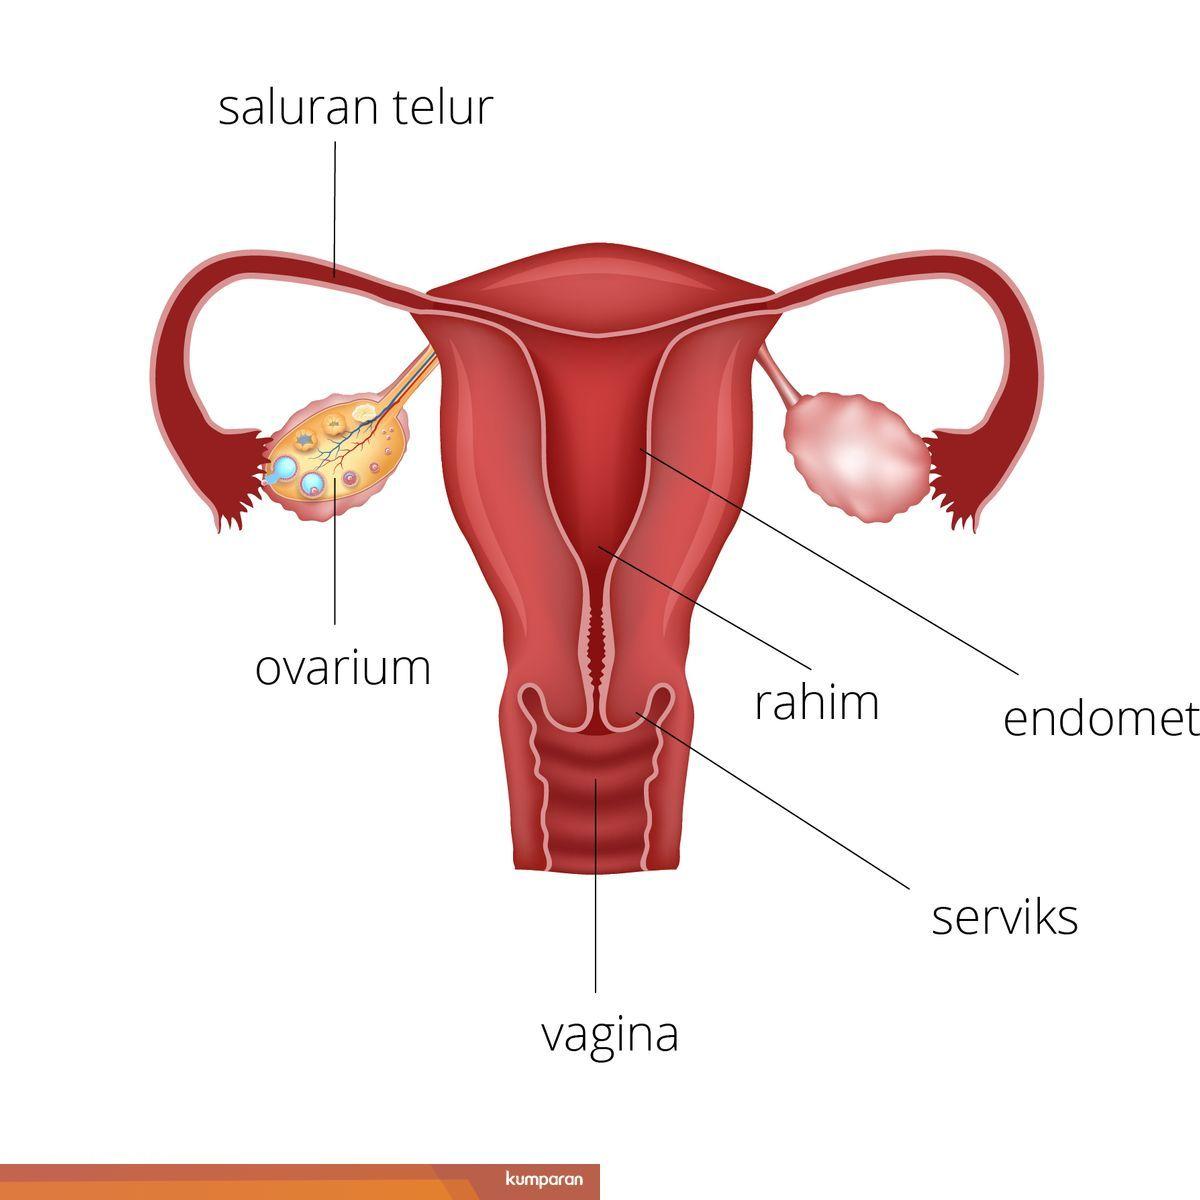 Semua Yang Anda Perlu Tahu Tentang Organ Reproduksi Wanita Kumparan Com